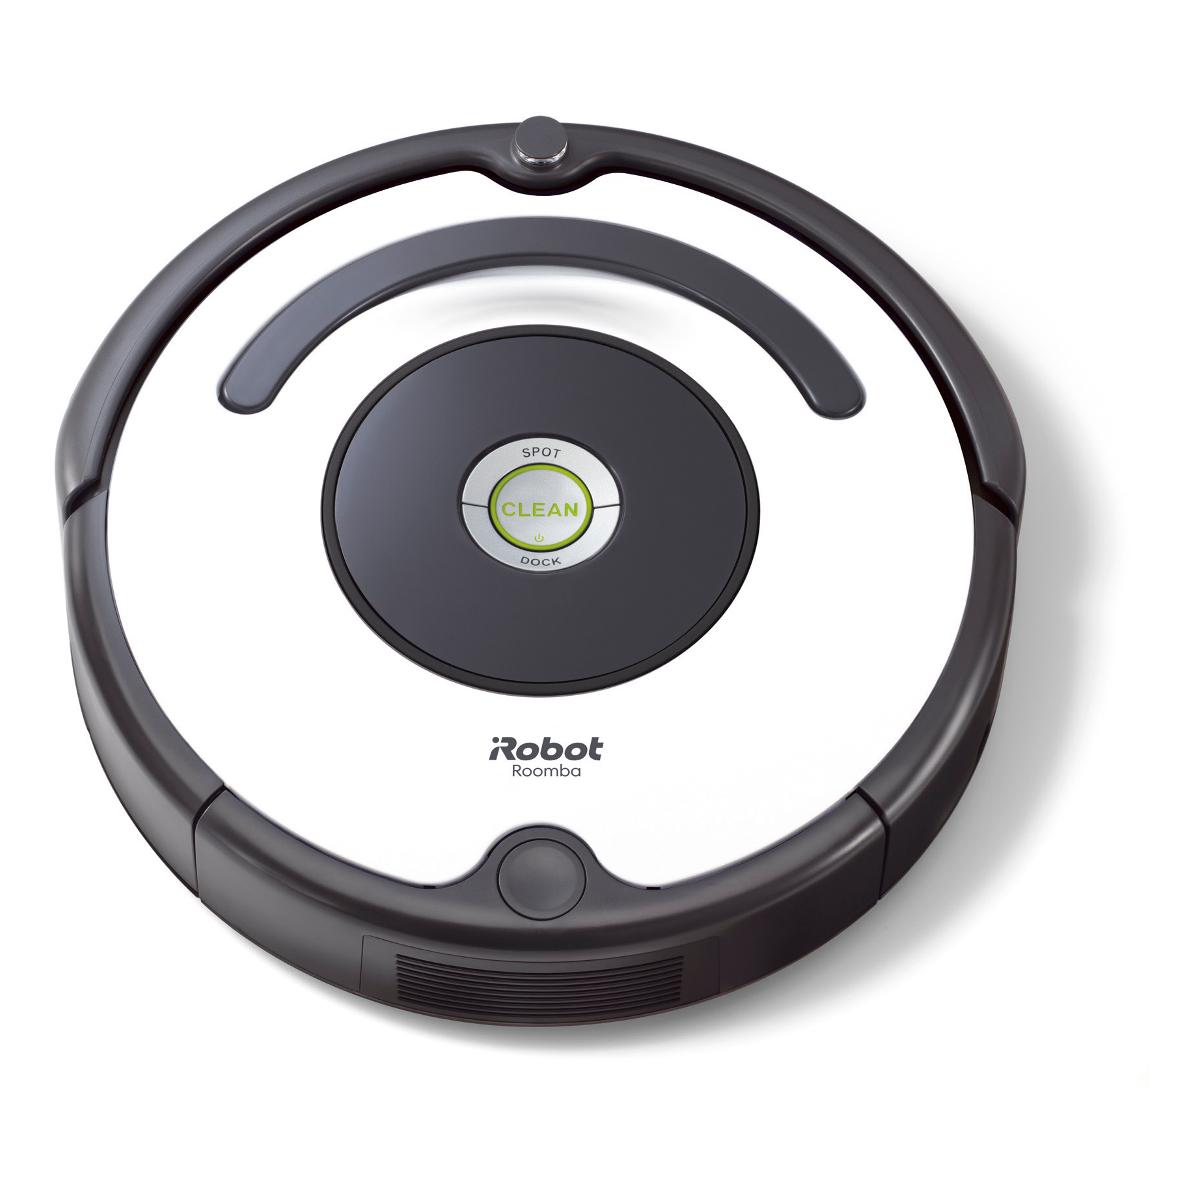 Irobot Roomba 675 Robot Vacuum Cleaner With 600ml Capacity